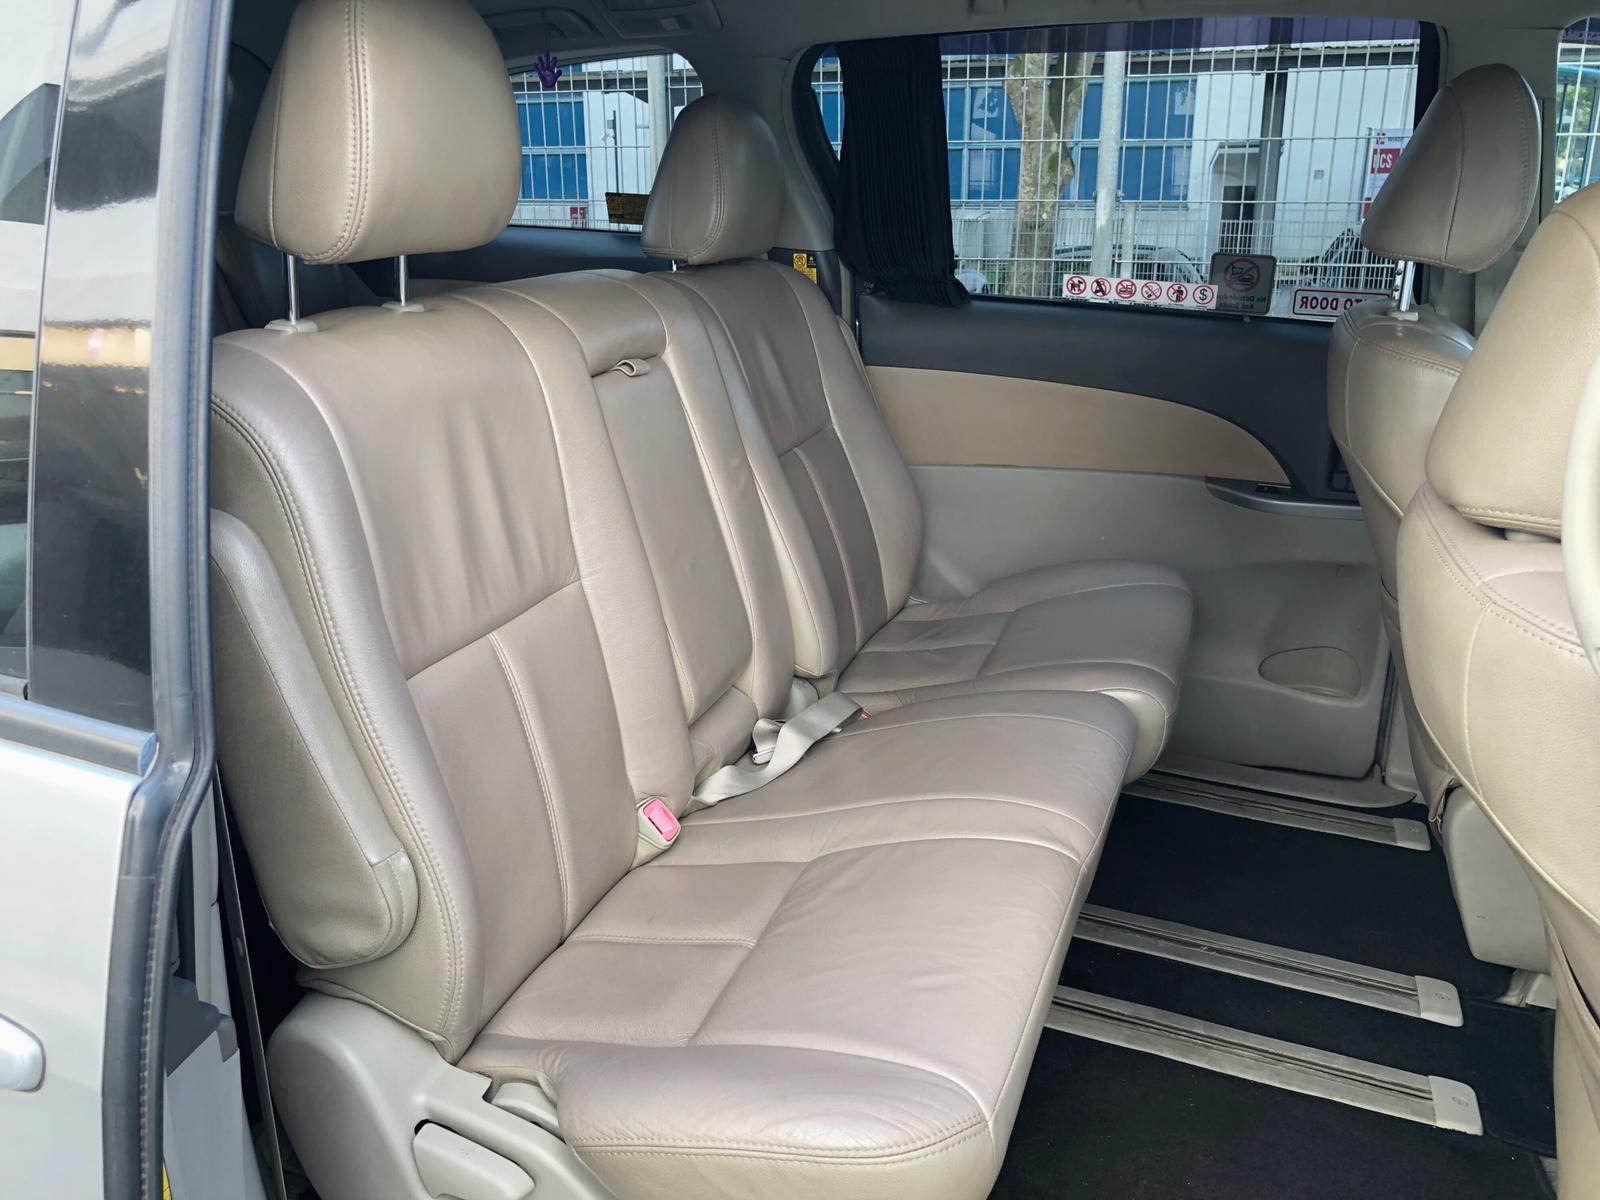 TOYOTA ESTIMA  Vios Wish Altis Car Axio Premio Allion Camry Honda Jazz Fit Stream Civic Cars Hyundai Avante Grab Rental Gojek Or Personal Use Low price and Cheap